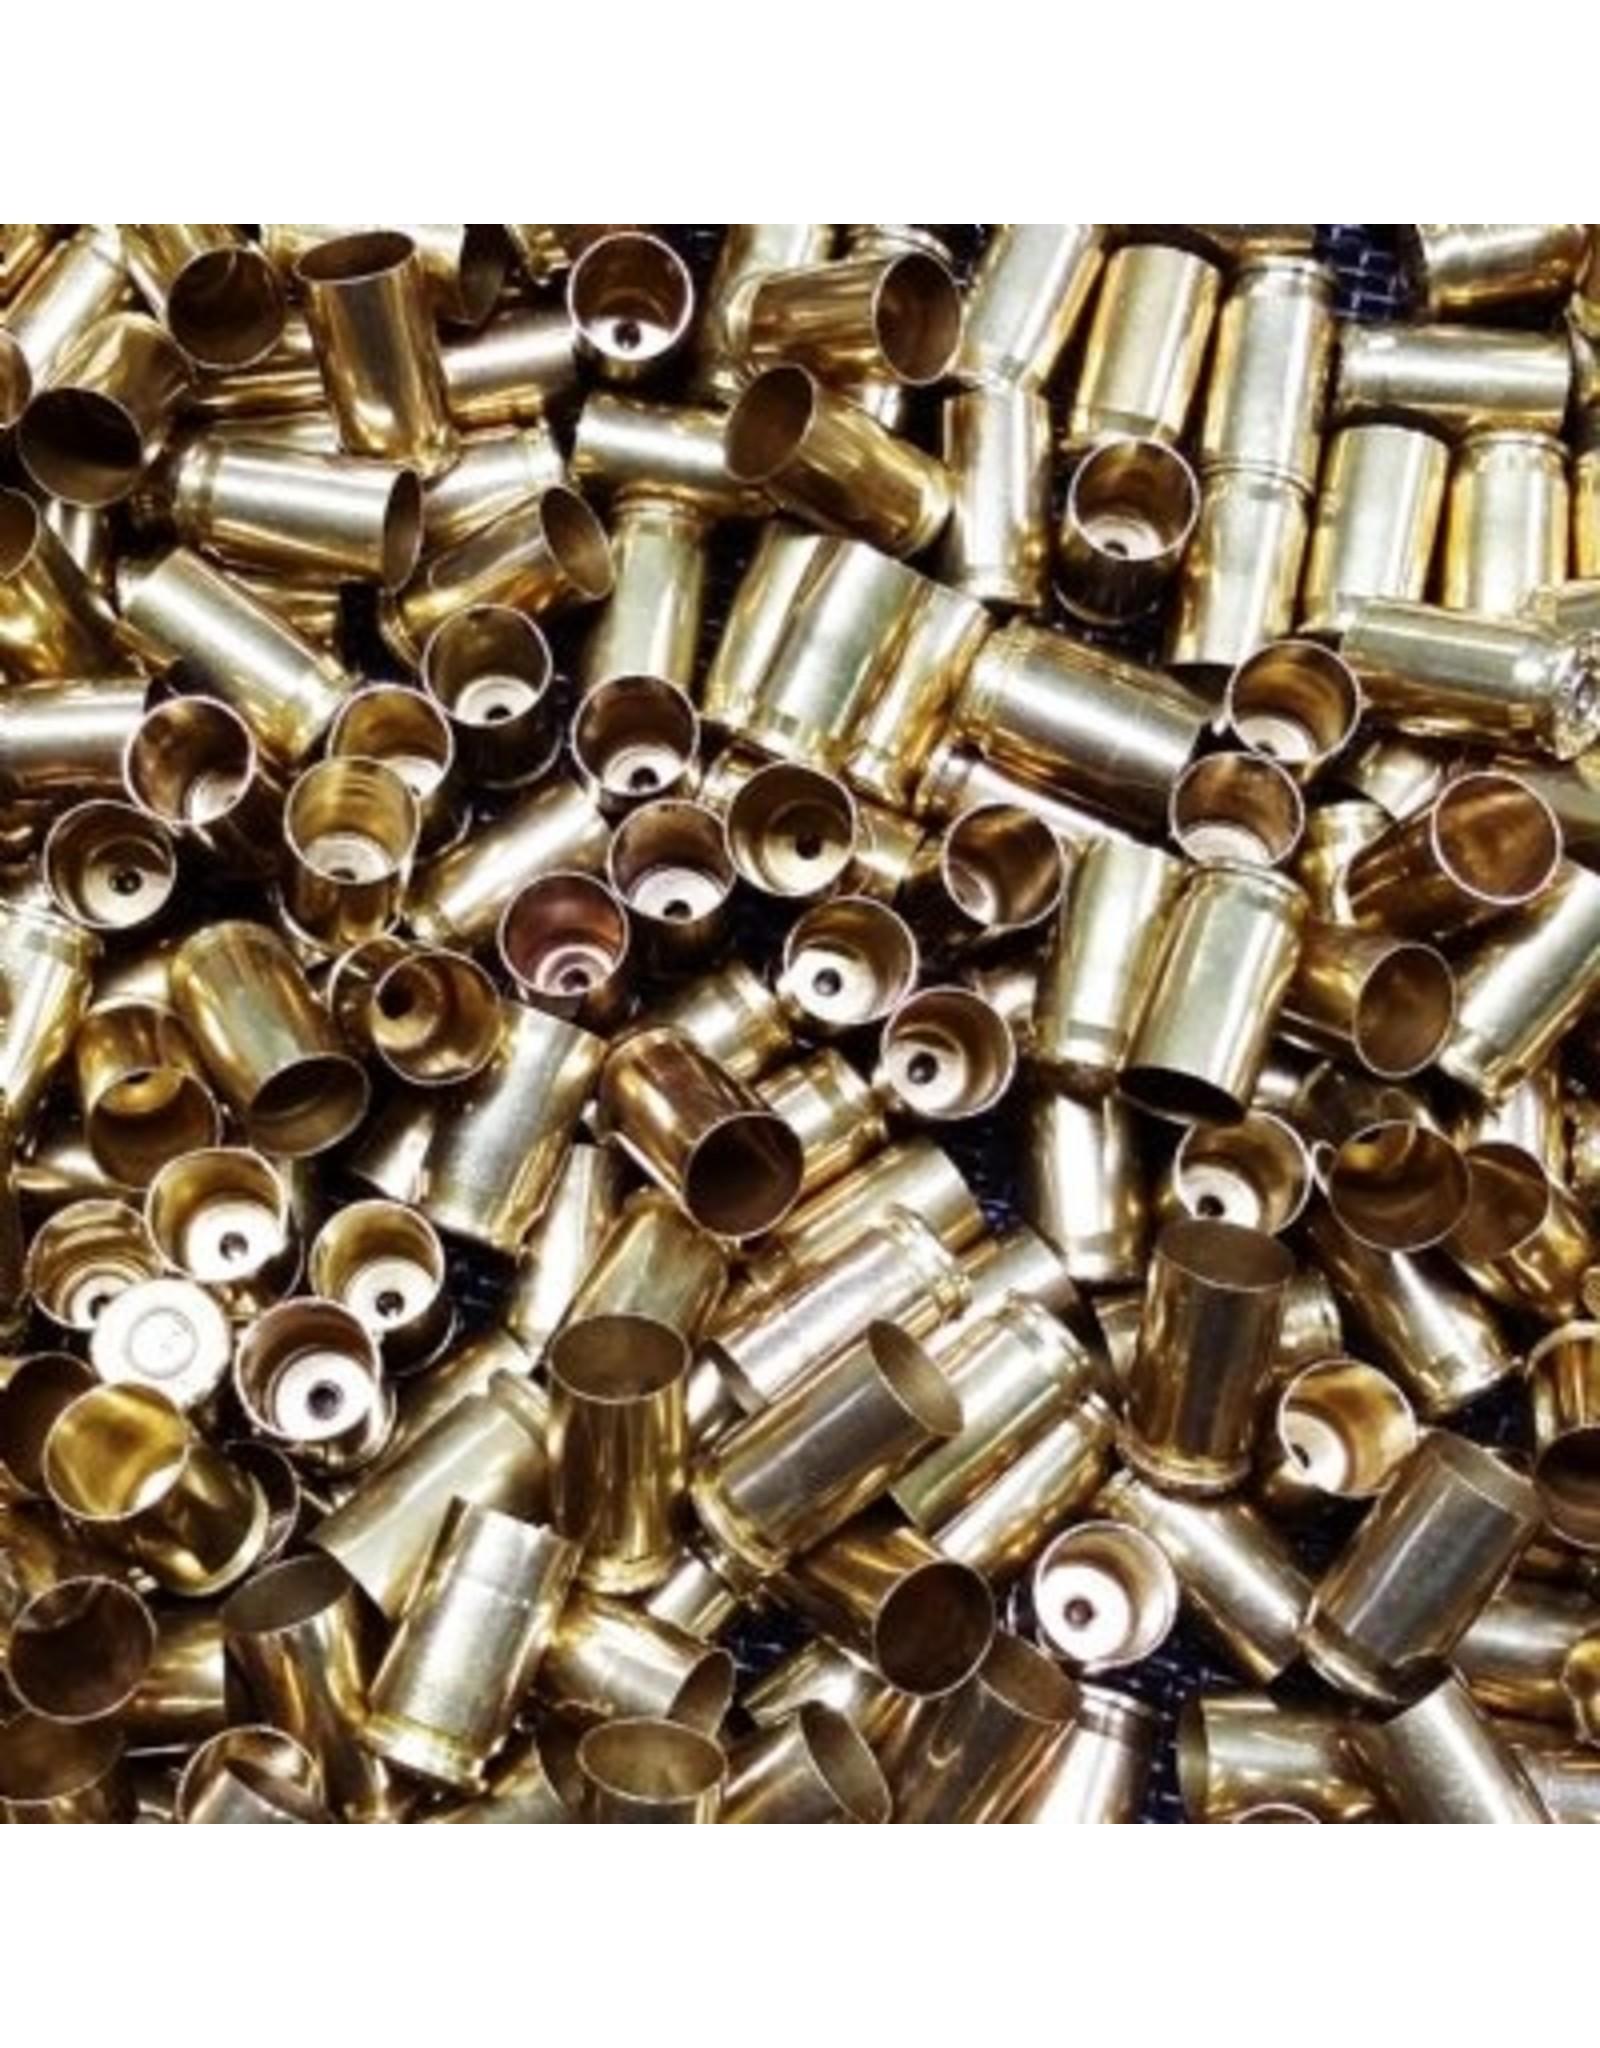 .380 ACP Brass - 350 Count